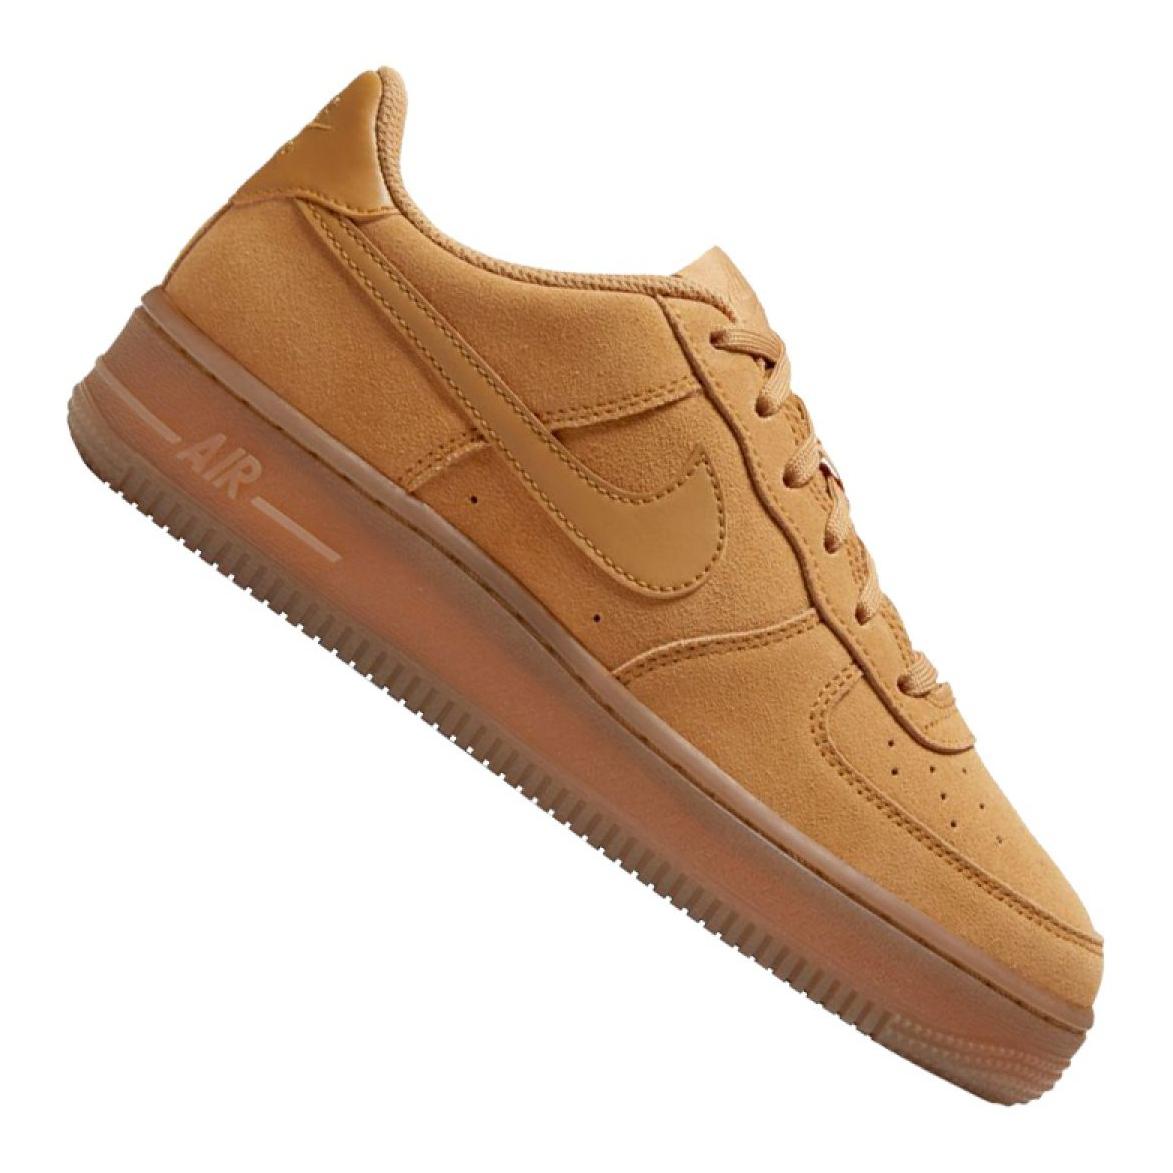 scarpe nike air force 1 marroni